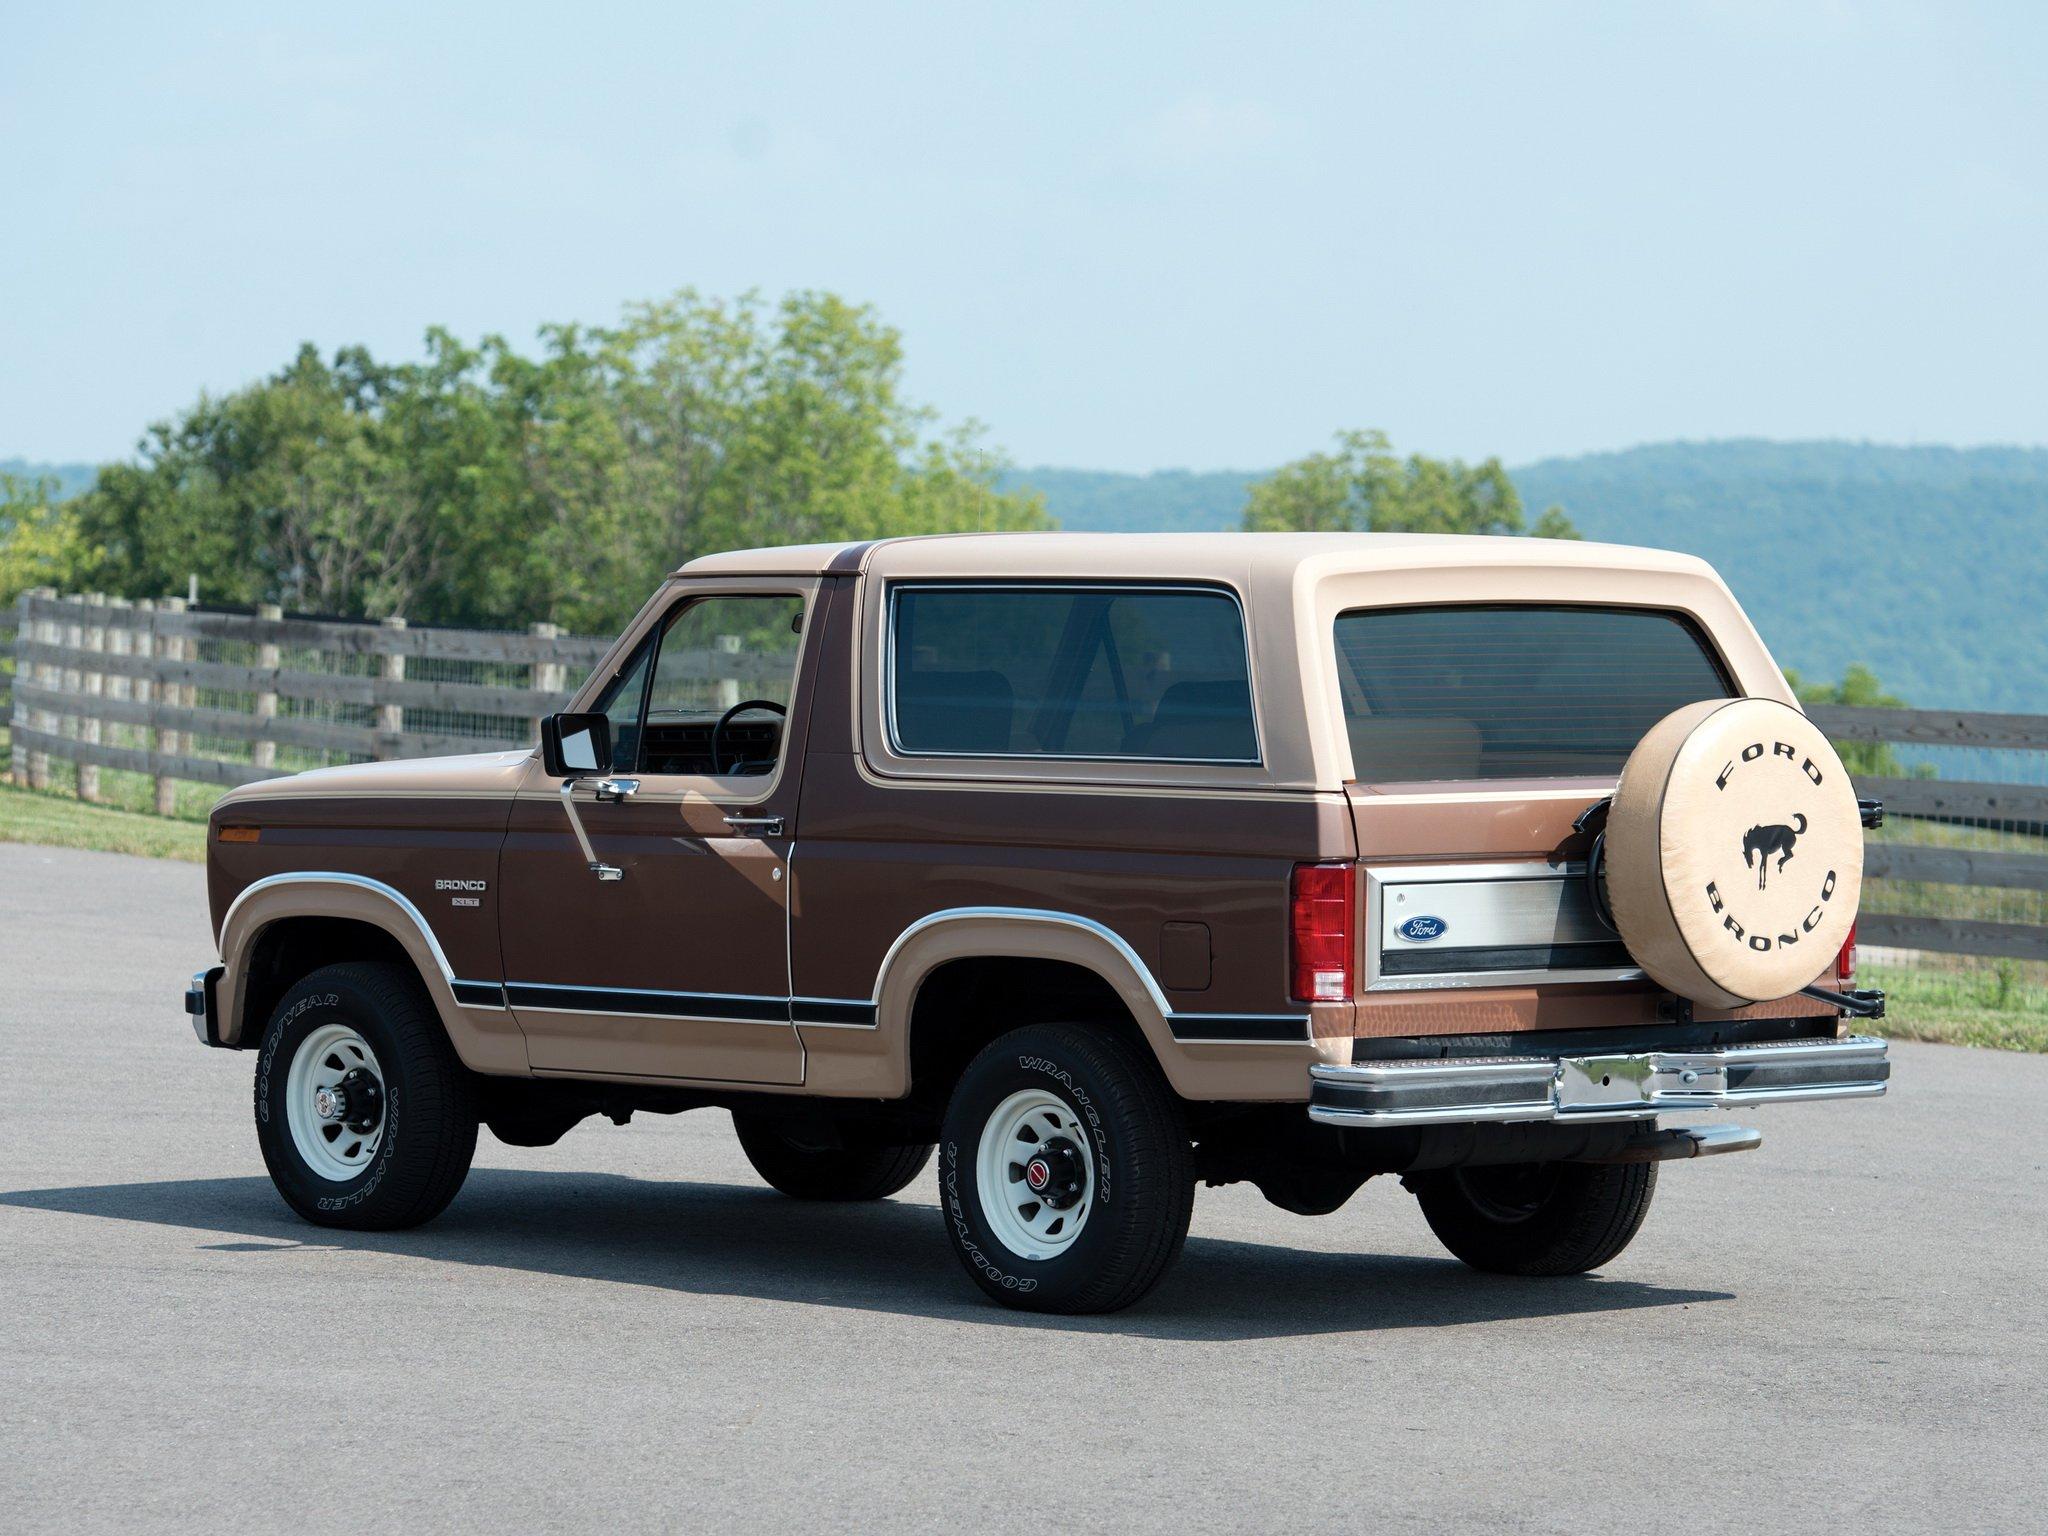 1982aei86 Ford Bronco XLT suv 4x4 wallpaper background 2048x1536